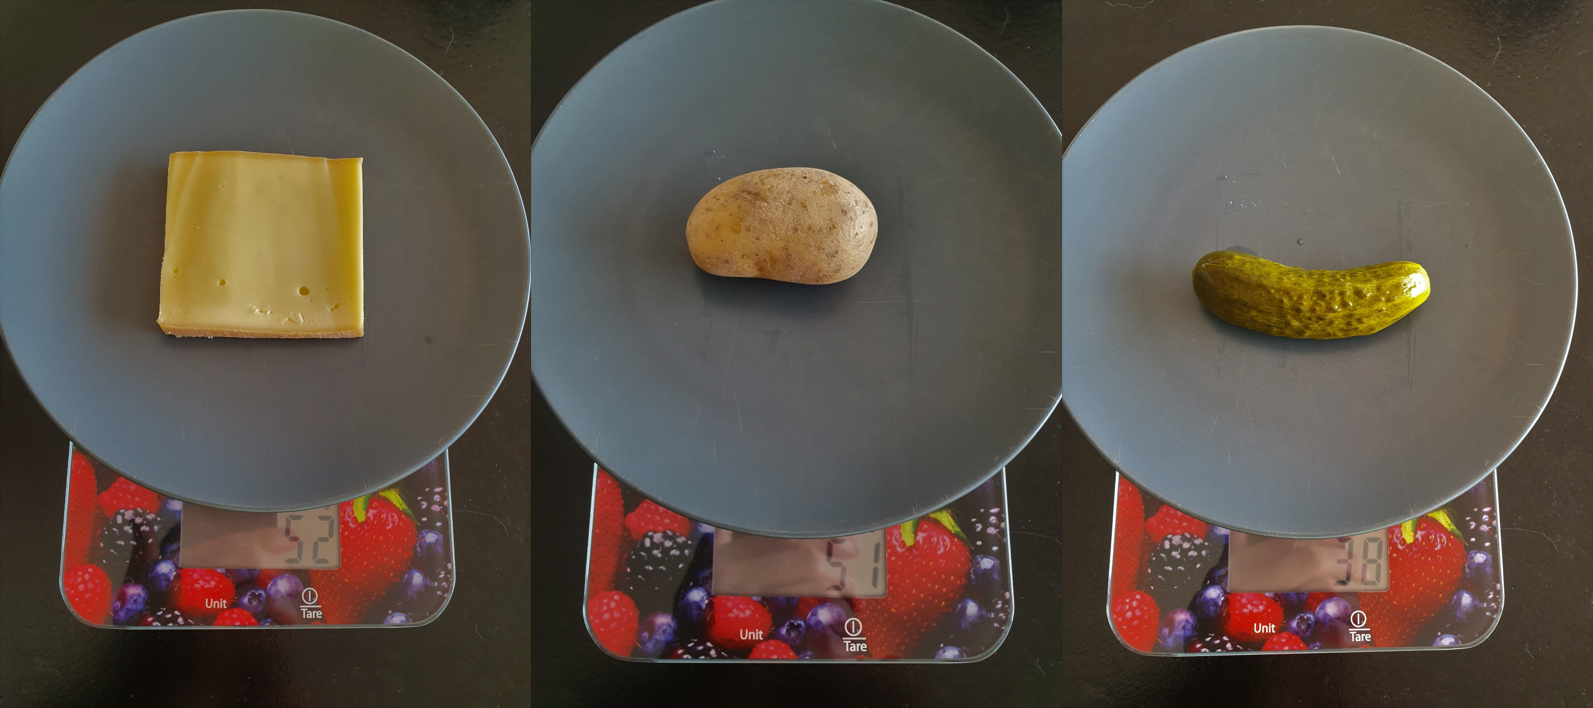 Poids raclette